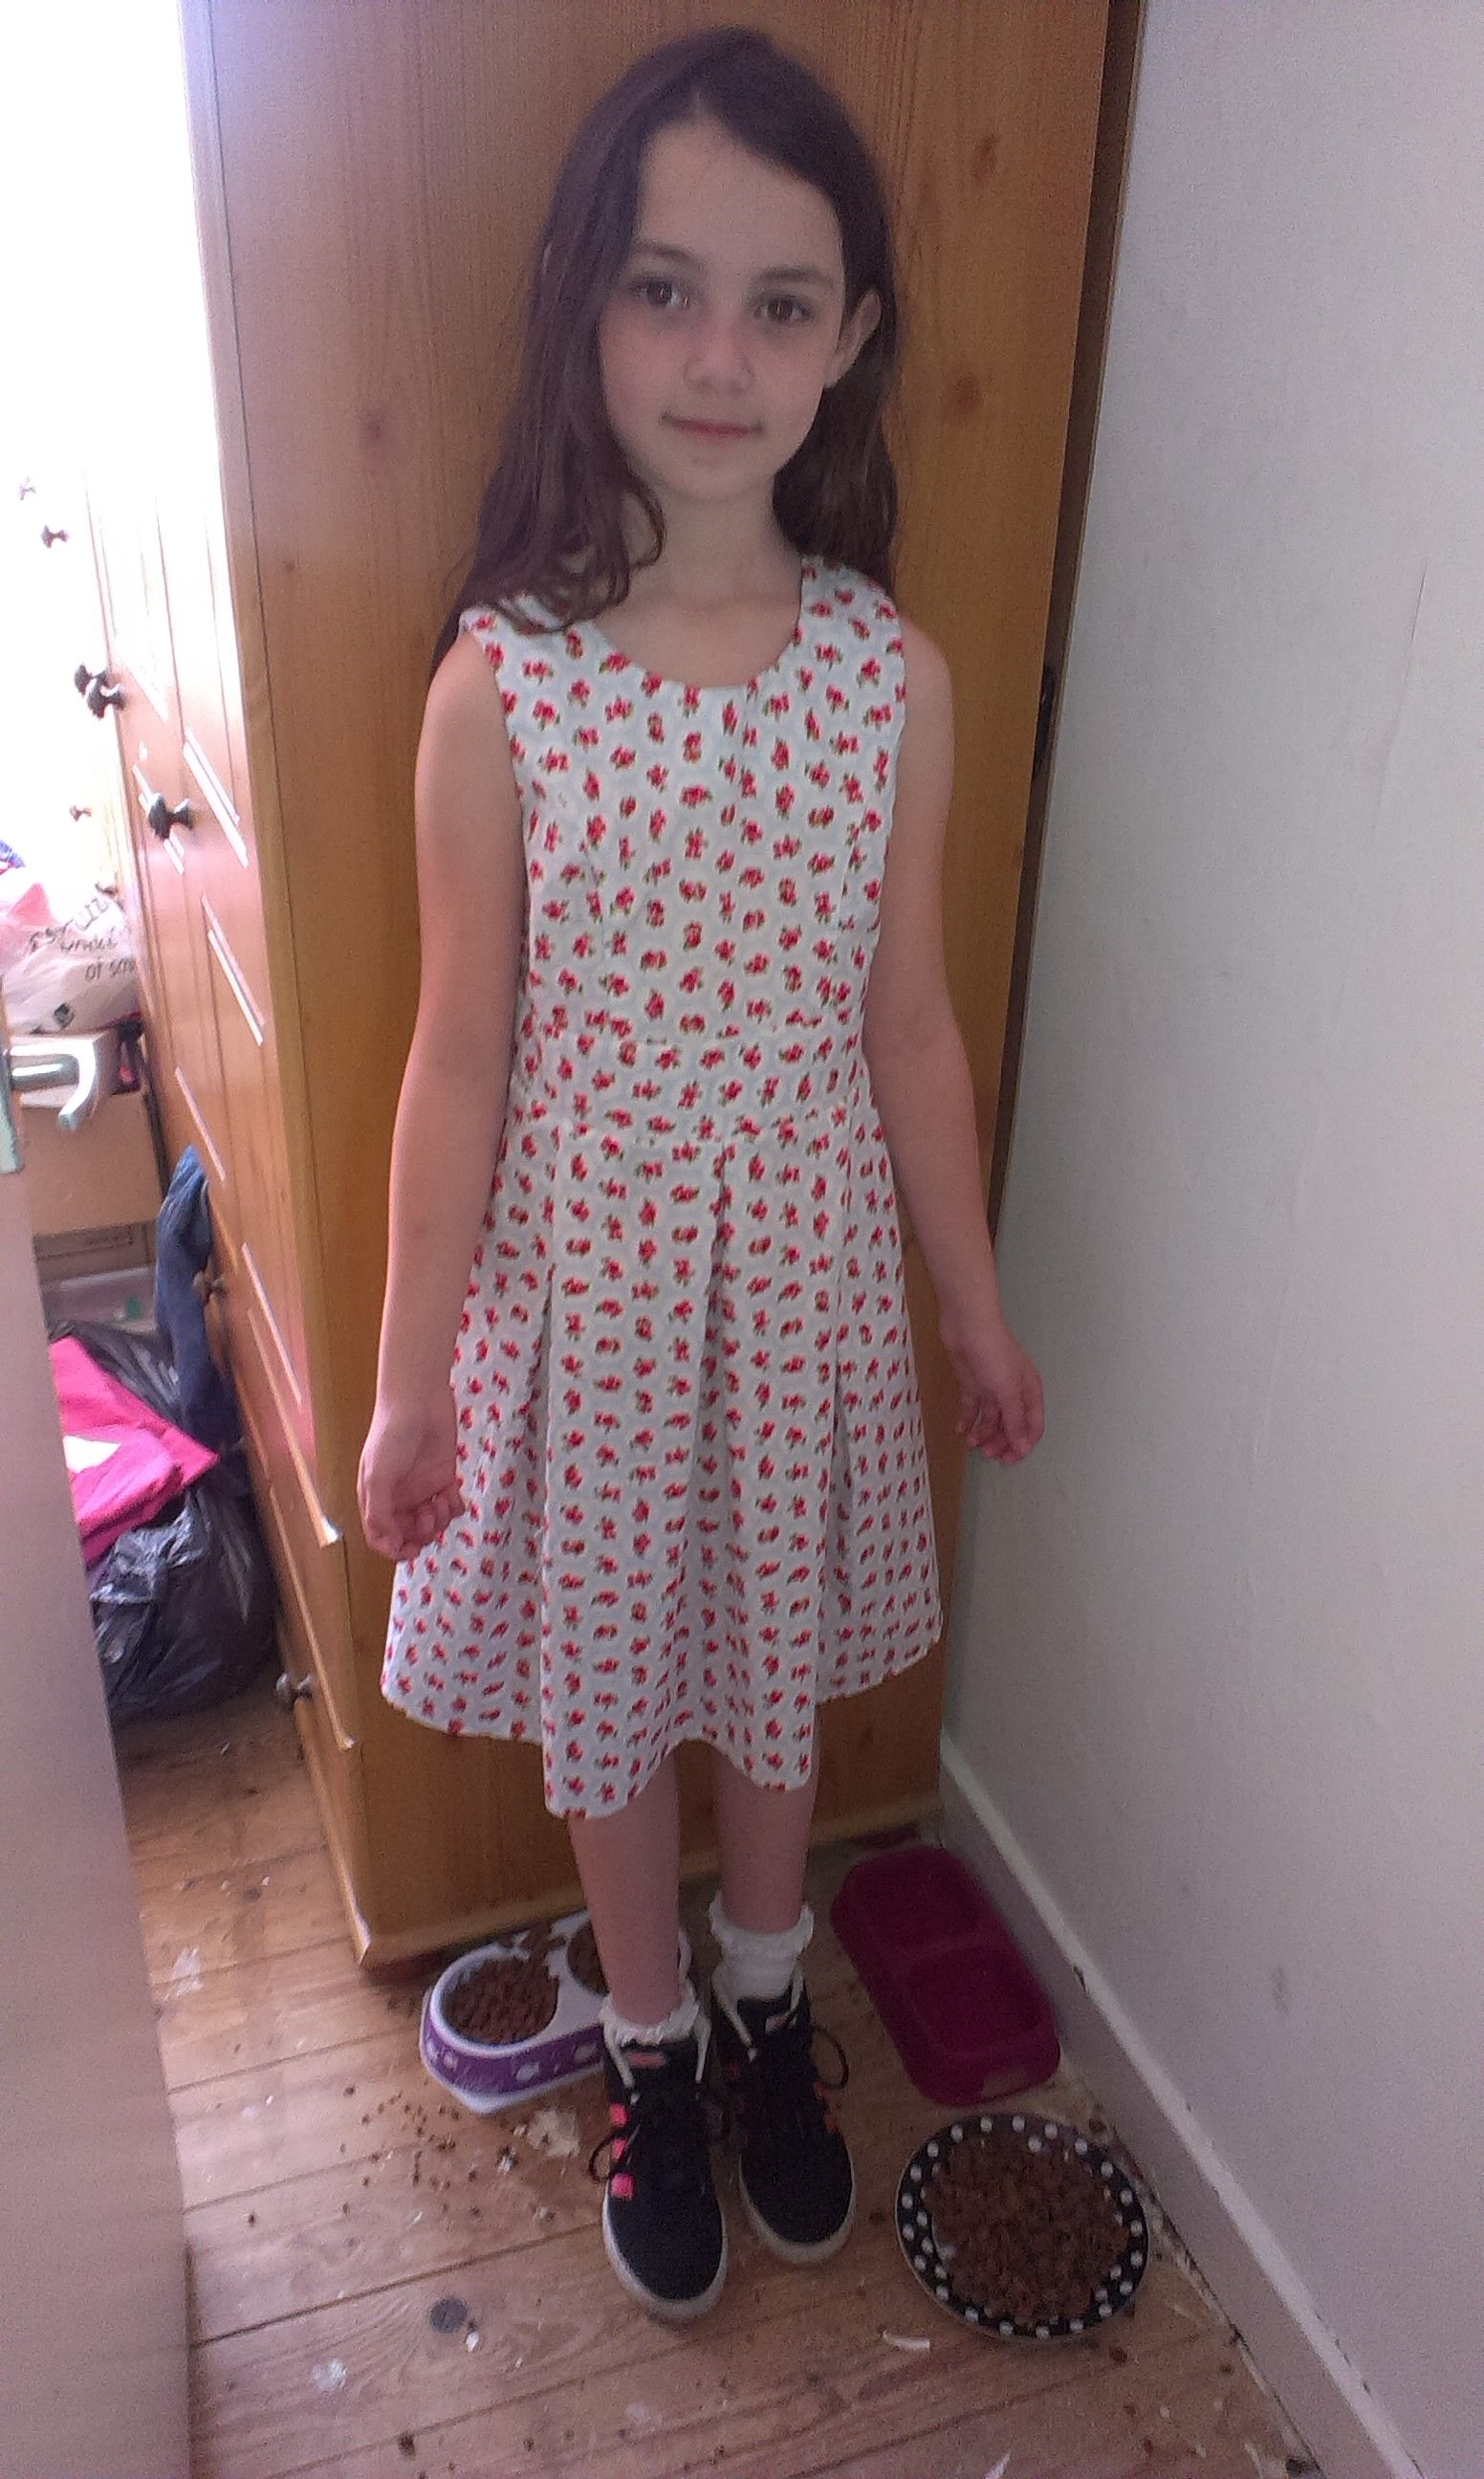 Skye with her new dress